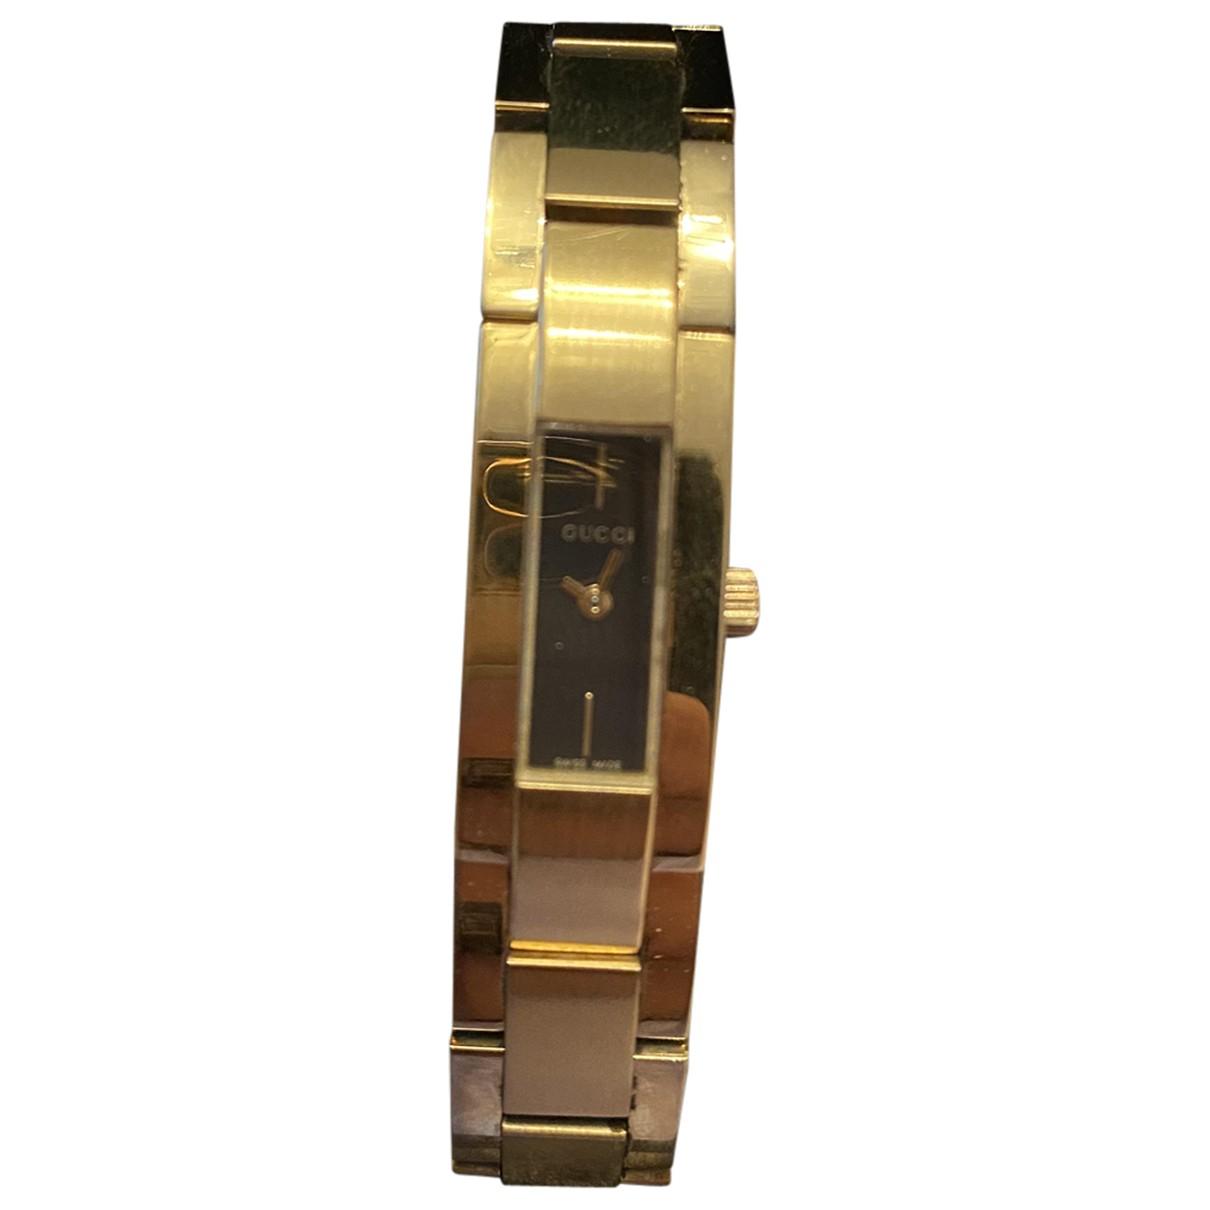 Gucci \N Uhr in  Gold Stahl